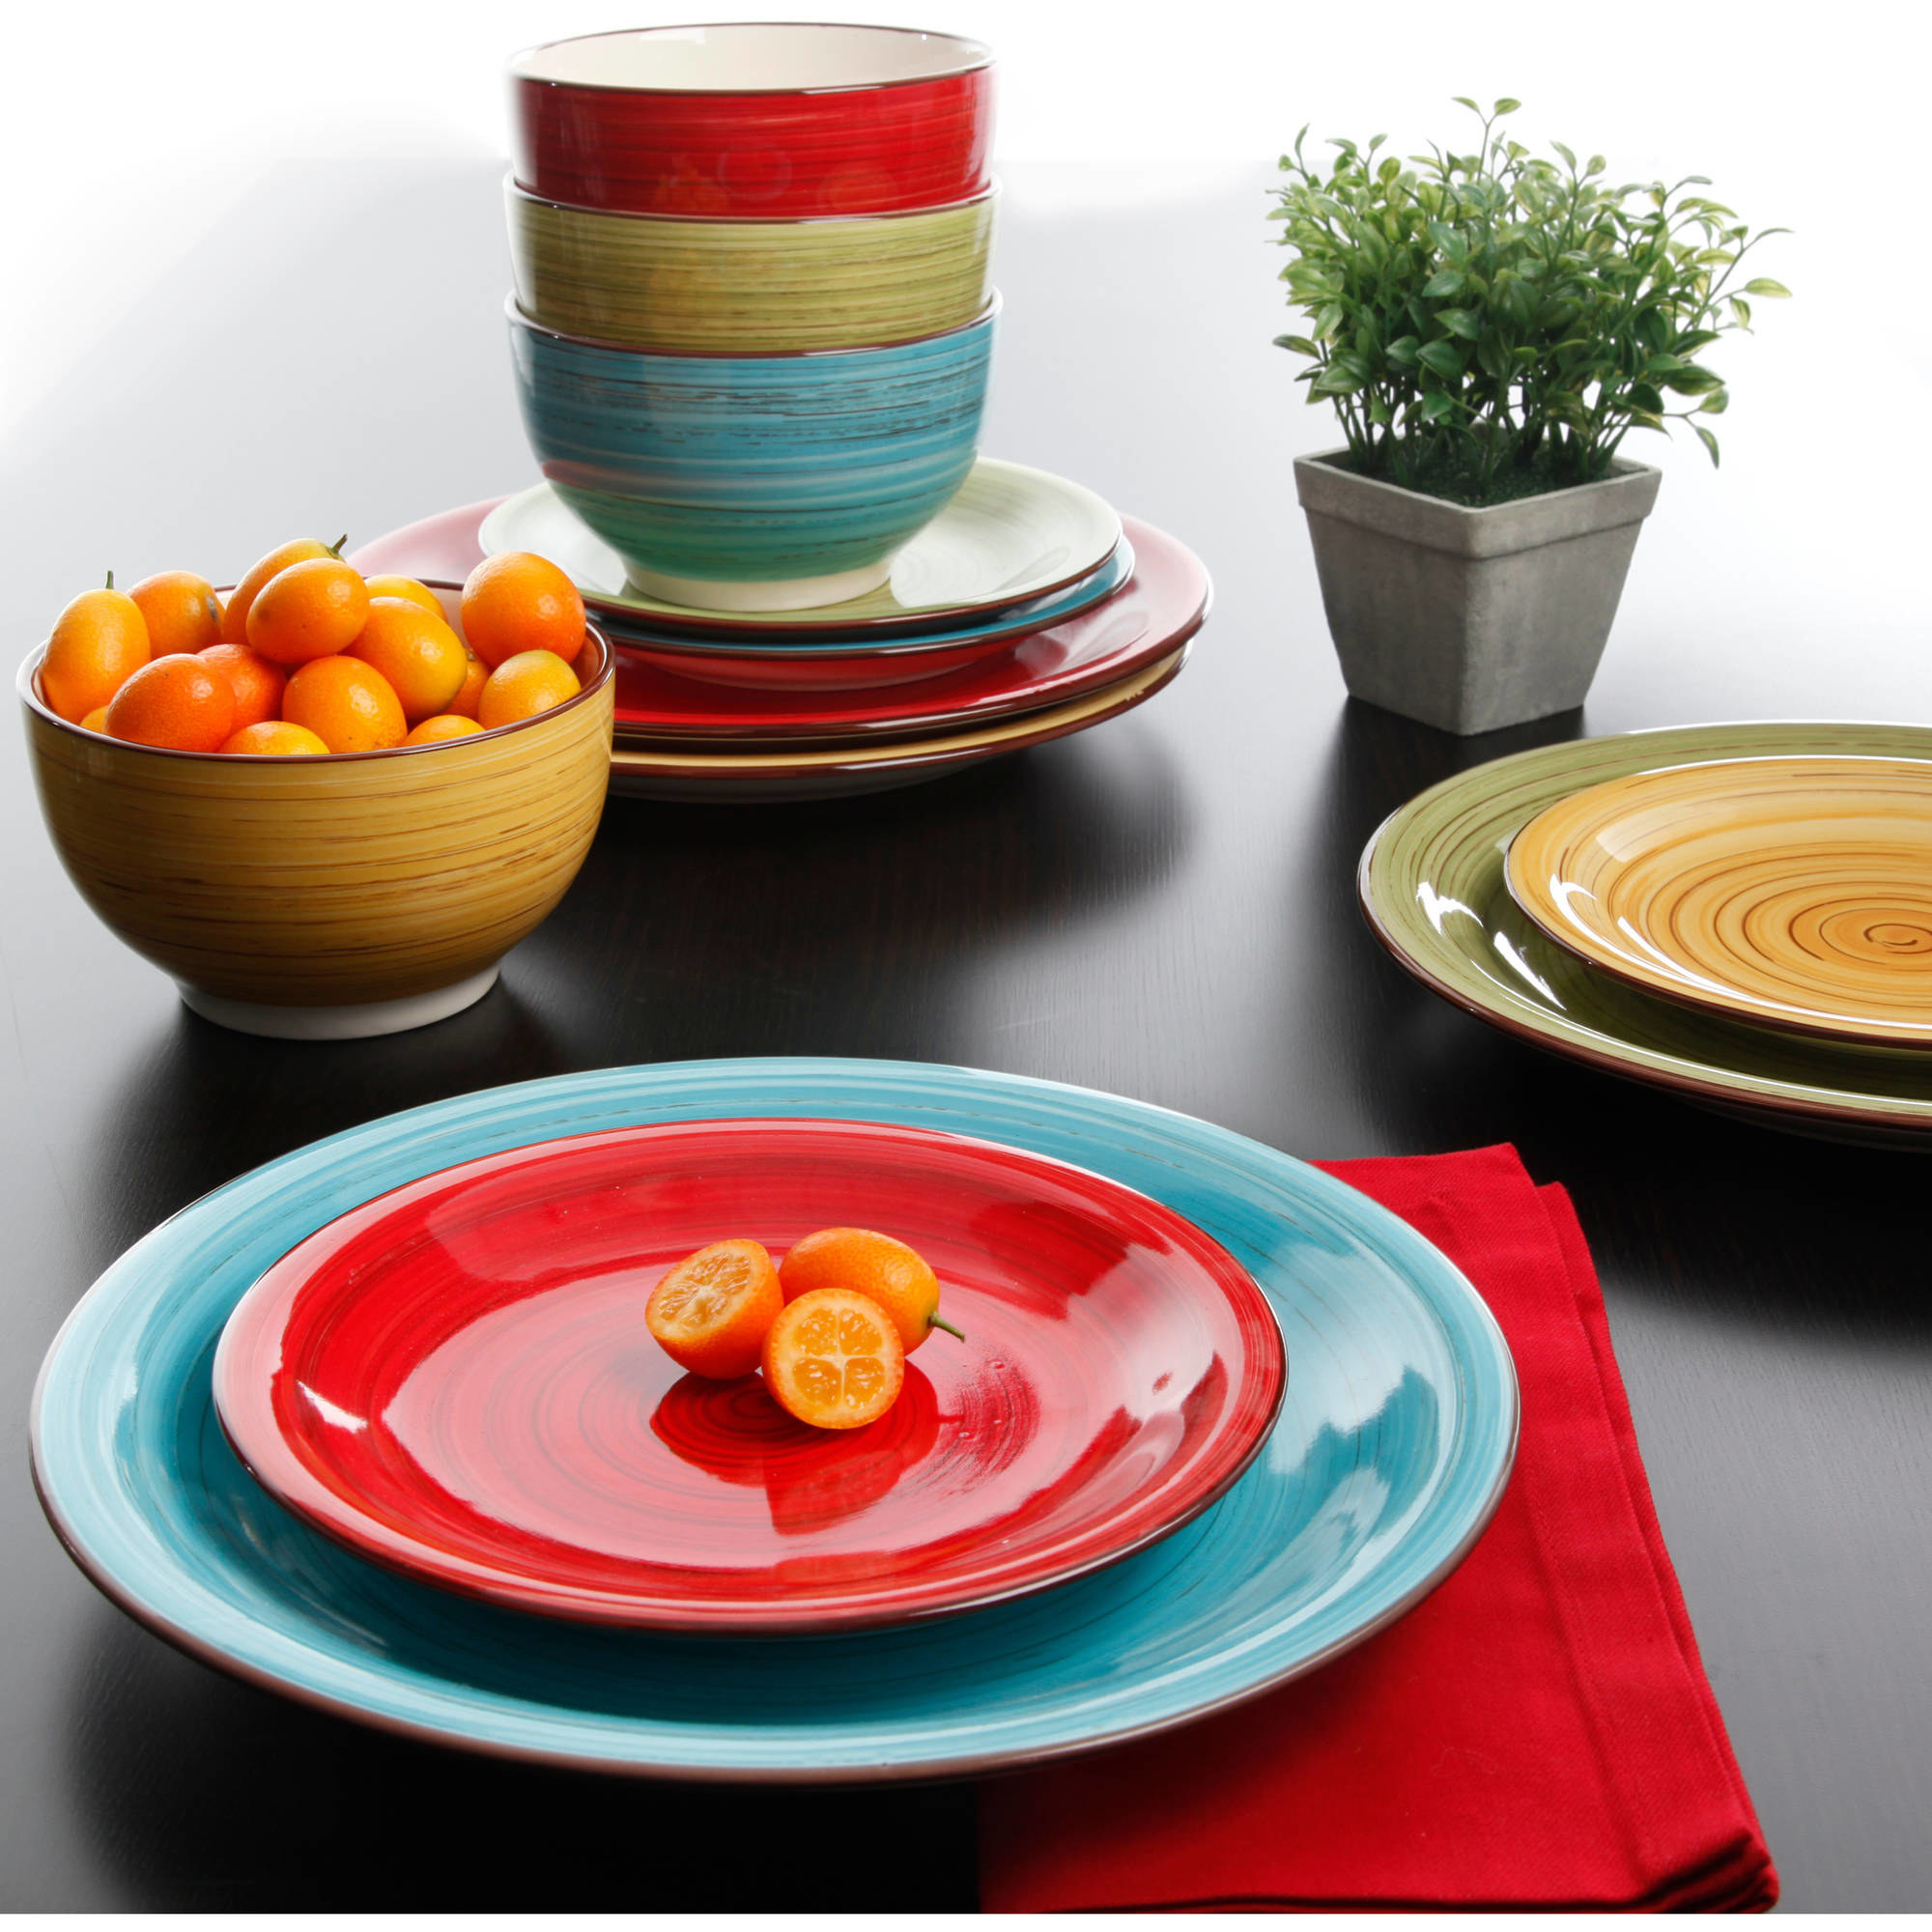 Thehand-painted festival dinnerware set of twelve